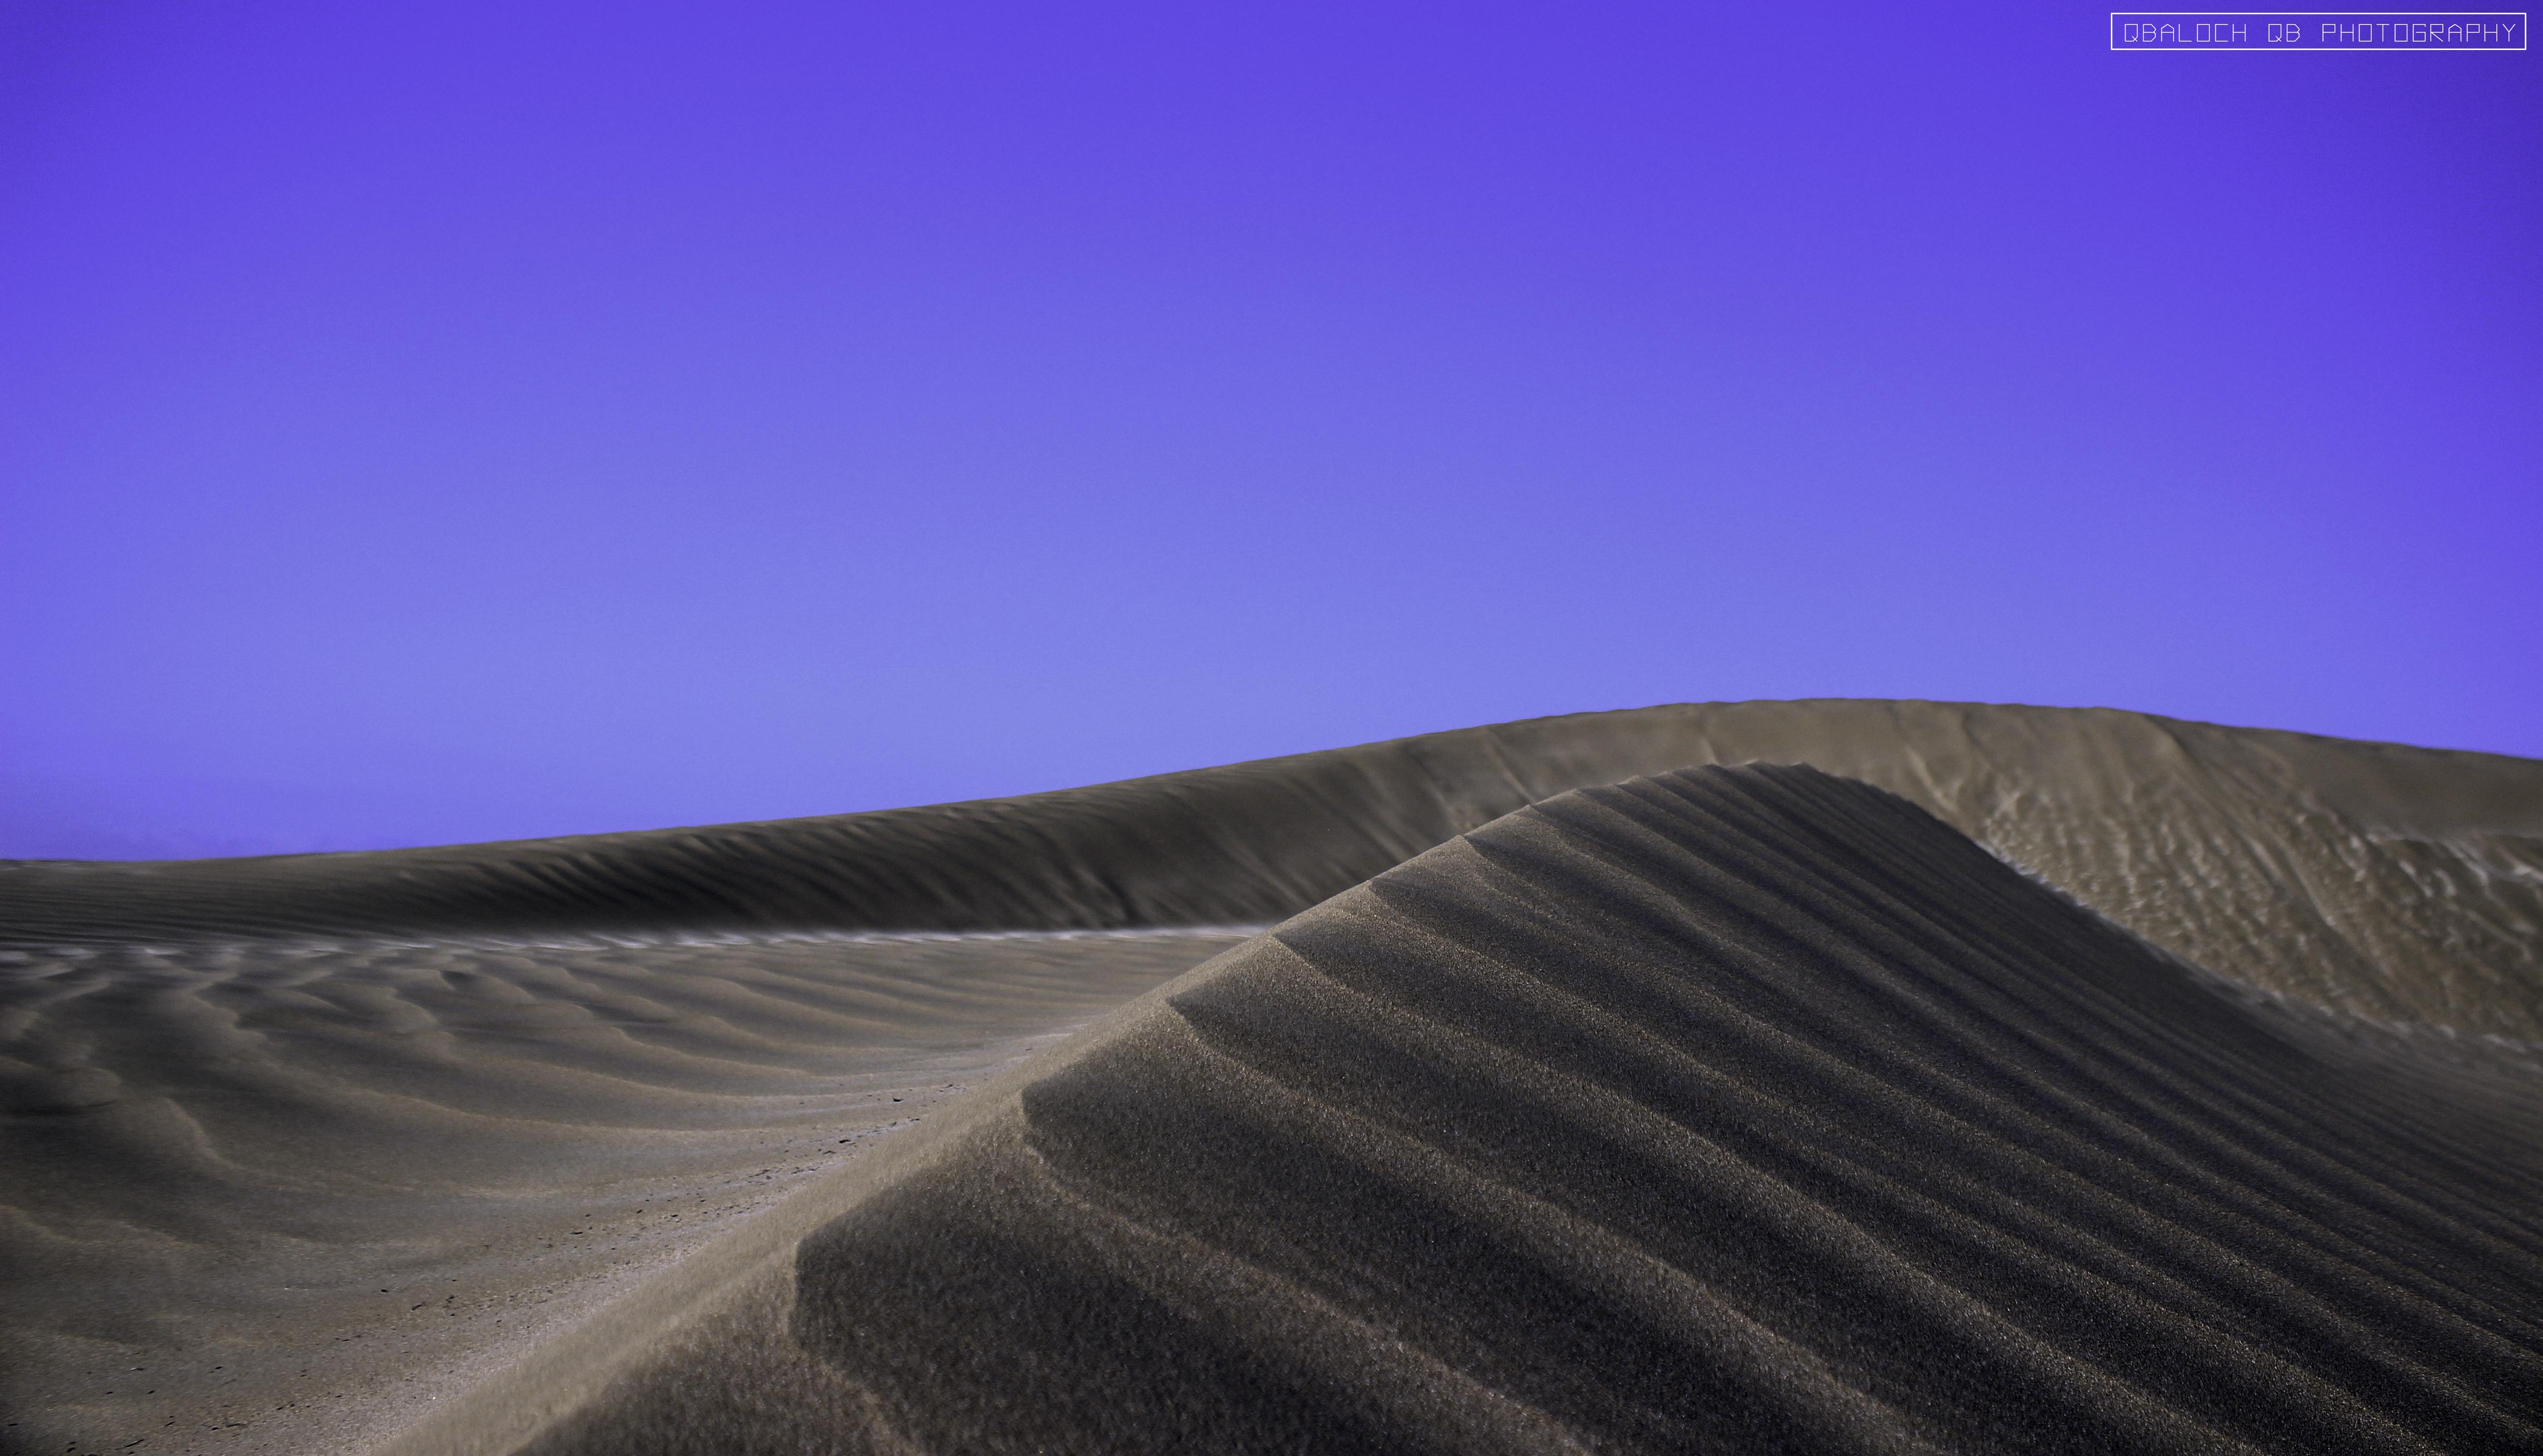 Pasni_Balochistan_Desert.jpg?uselang=zh-cn